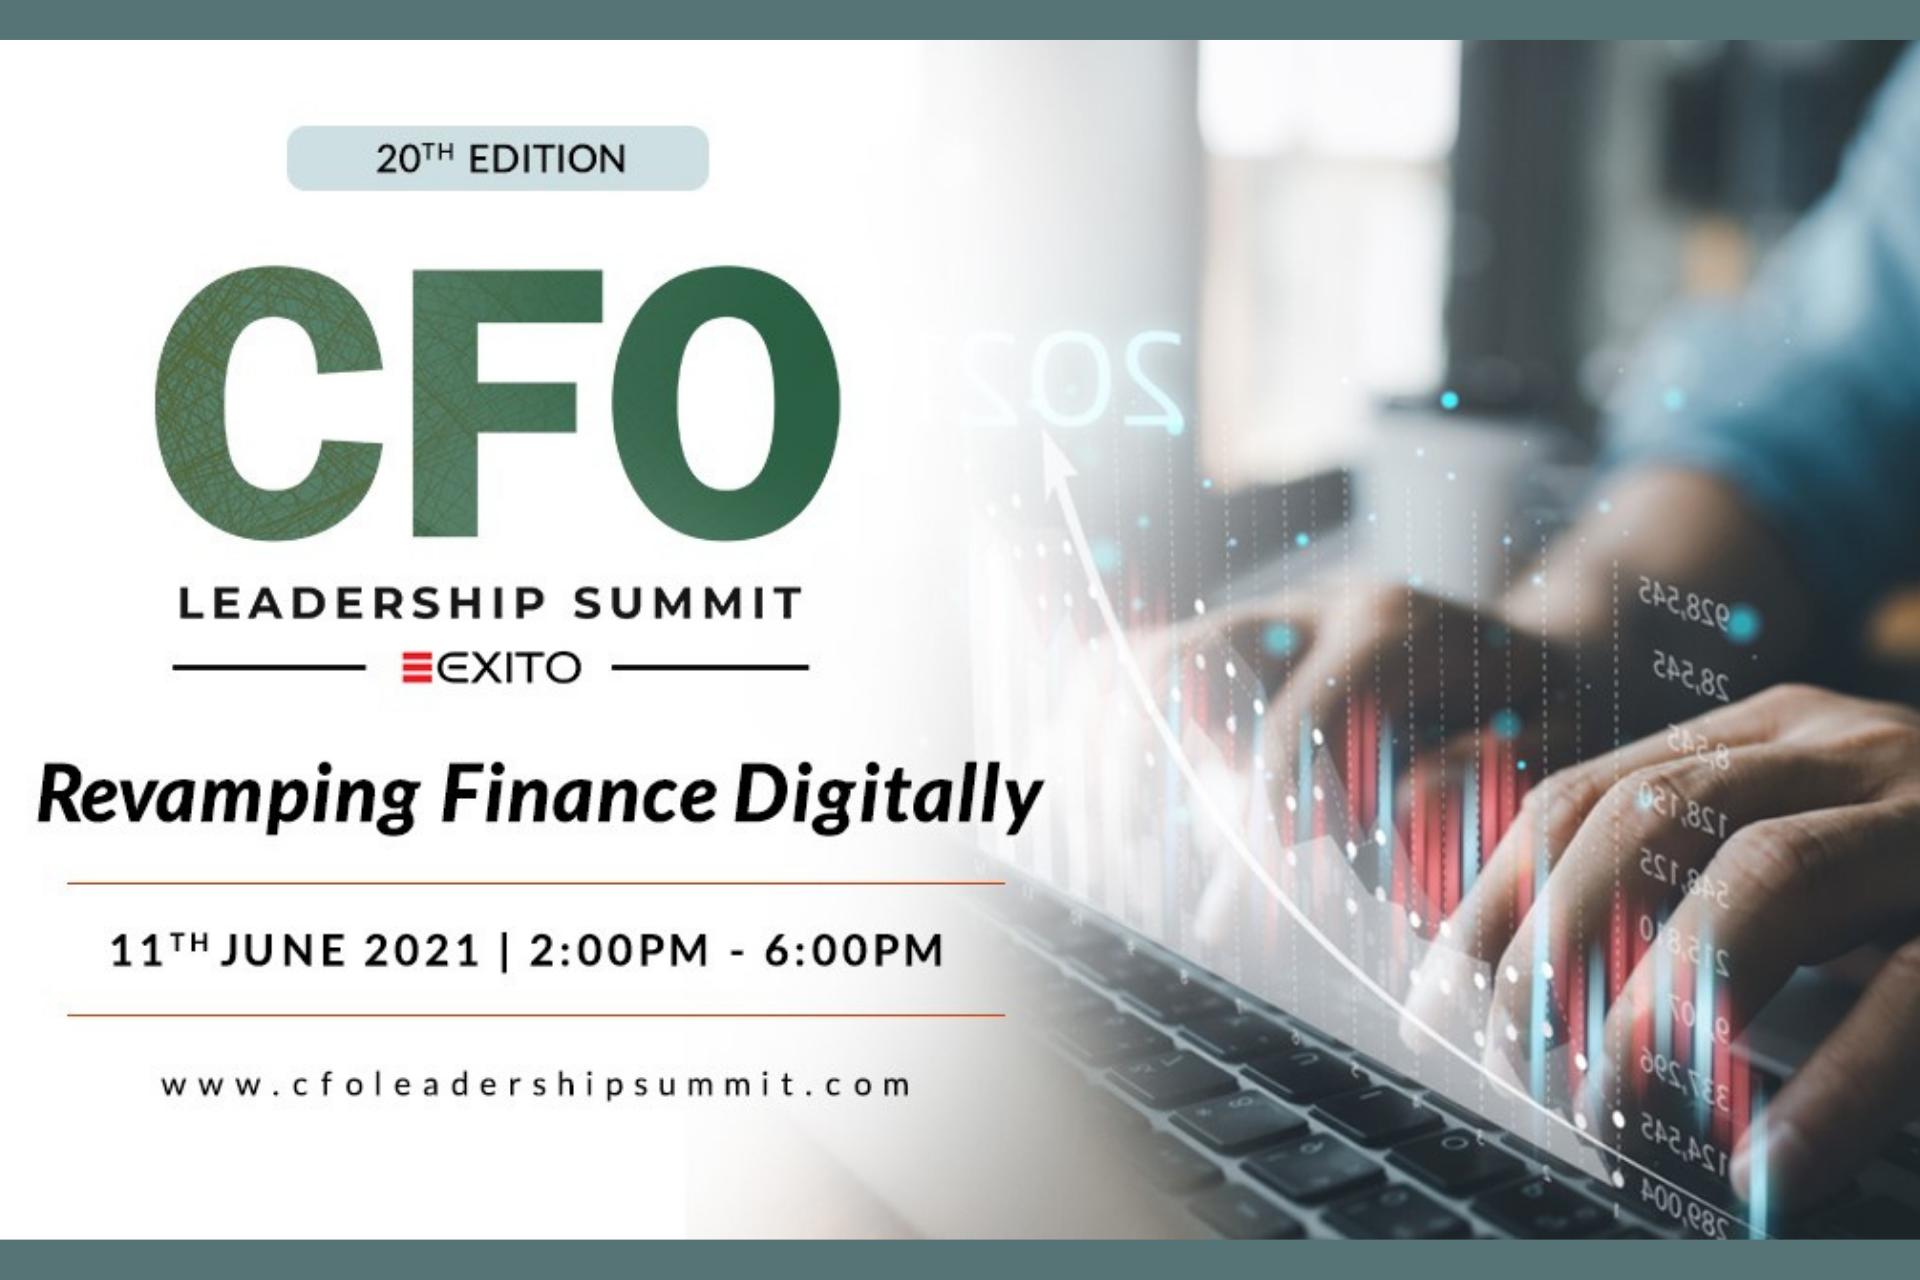 20th Edition CFO Leadership Summit: revamping finance digitally